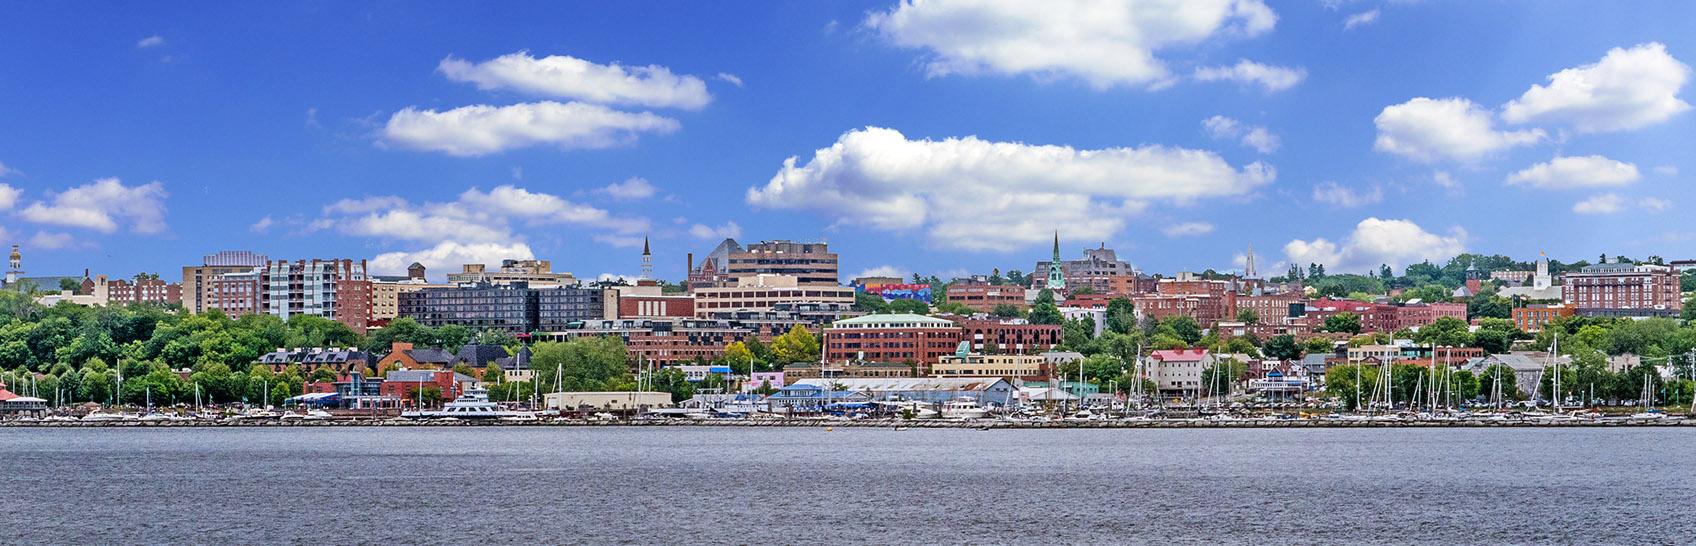 Greater Burlington Vermont real estate